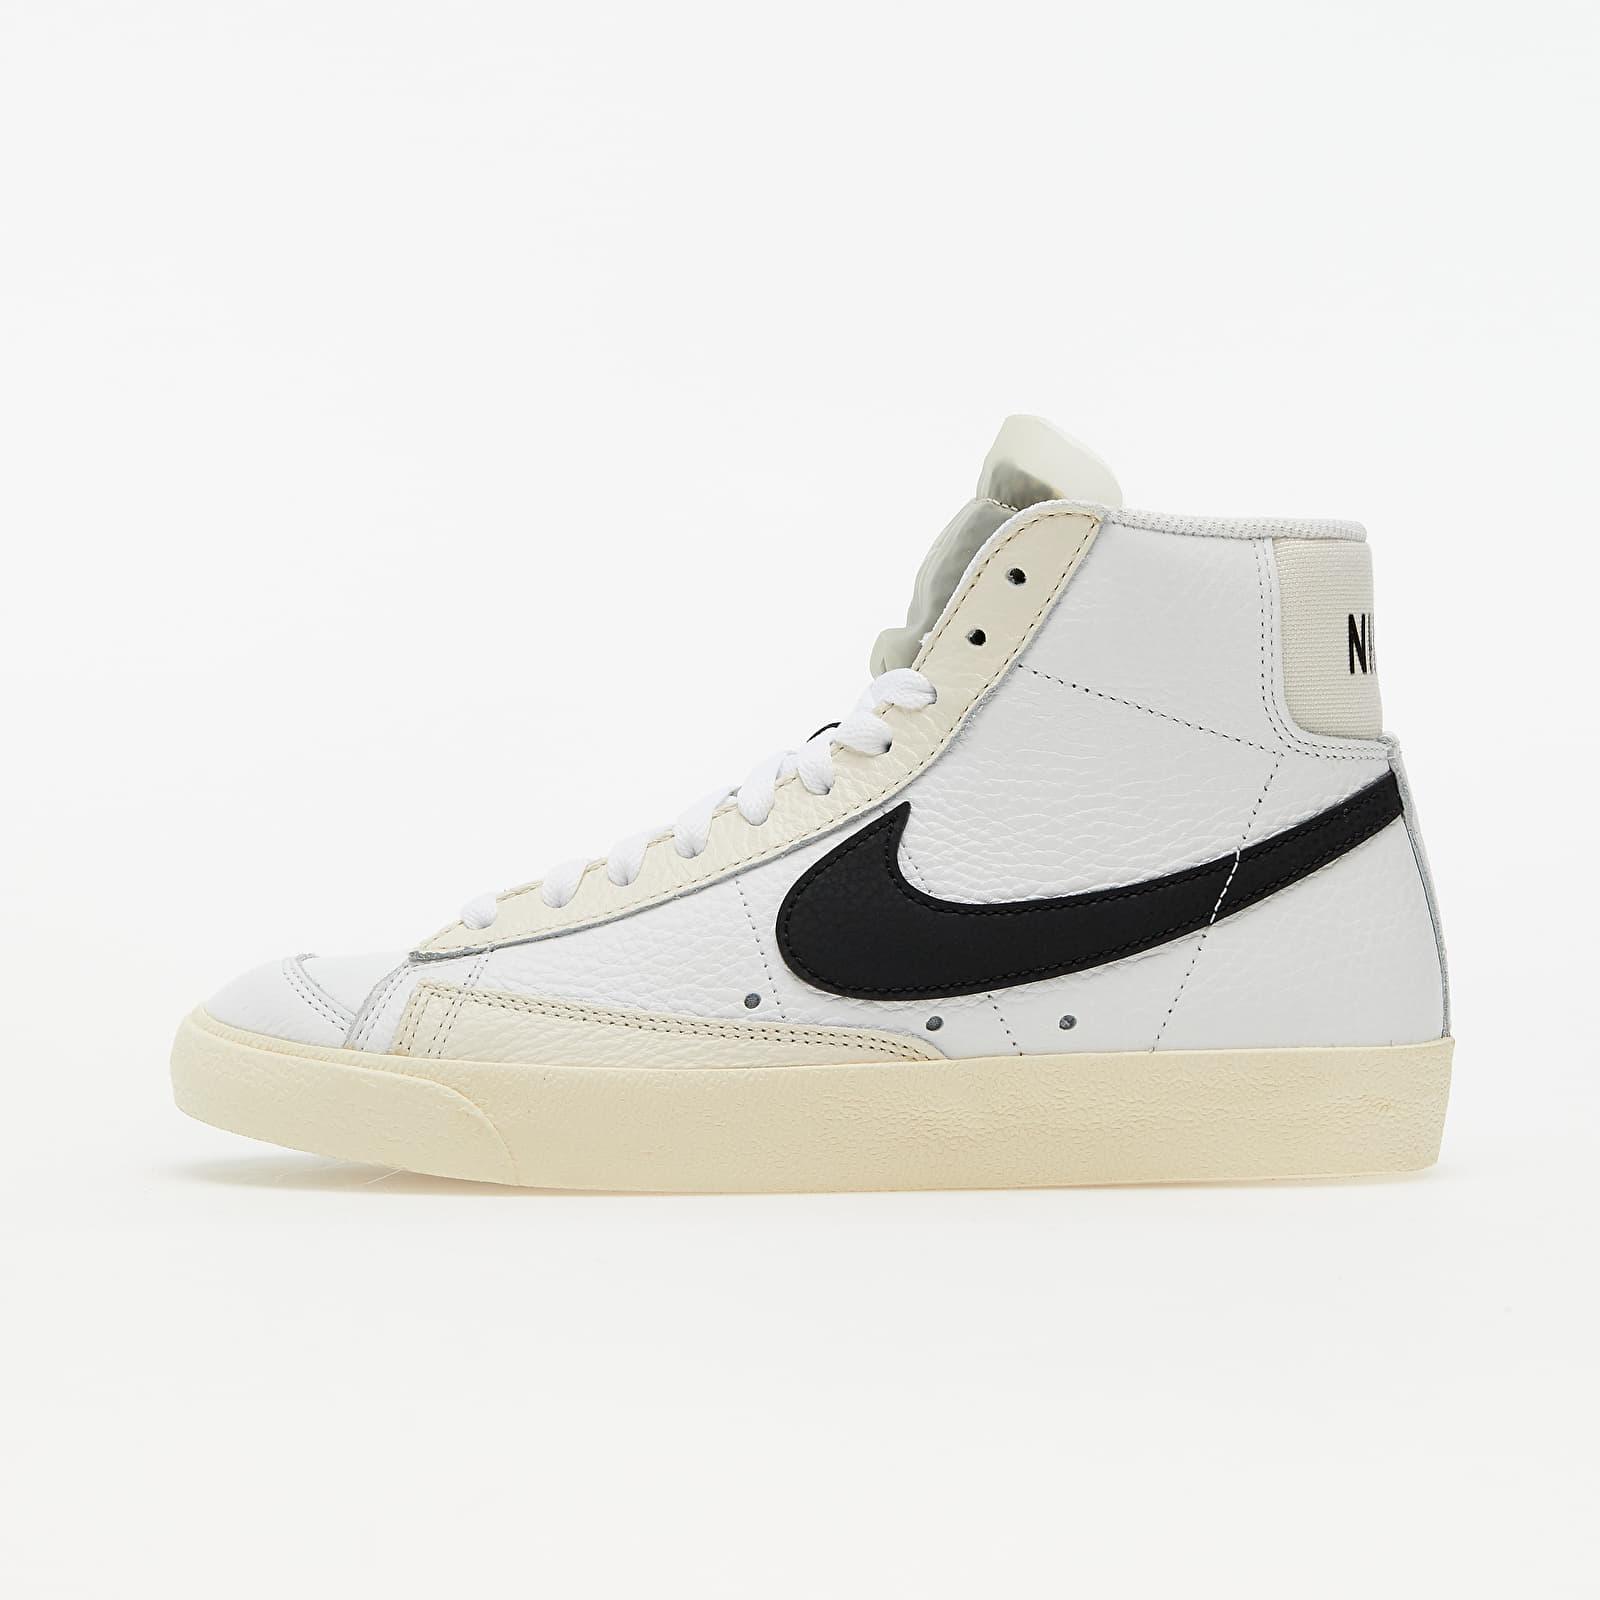 Nike Blazer Mid '77 Summit White/ Black-Pale Ivory-Beach DD6621-100